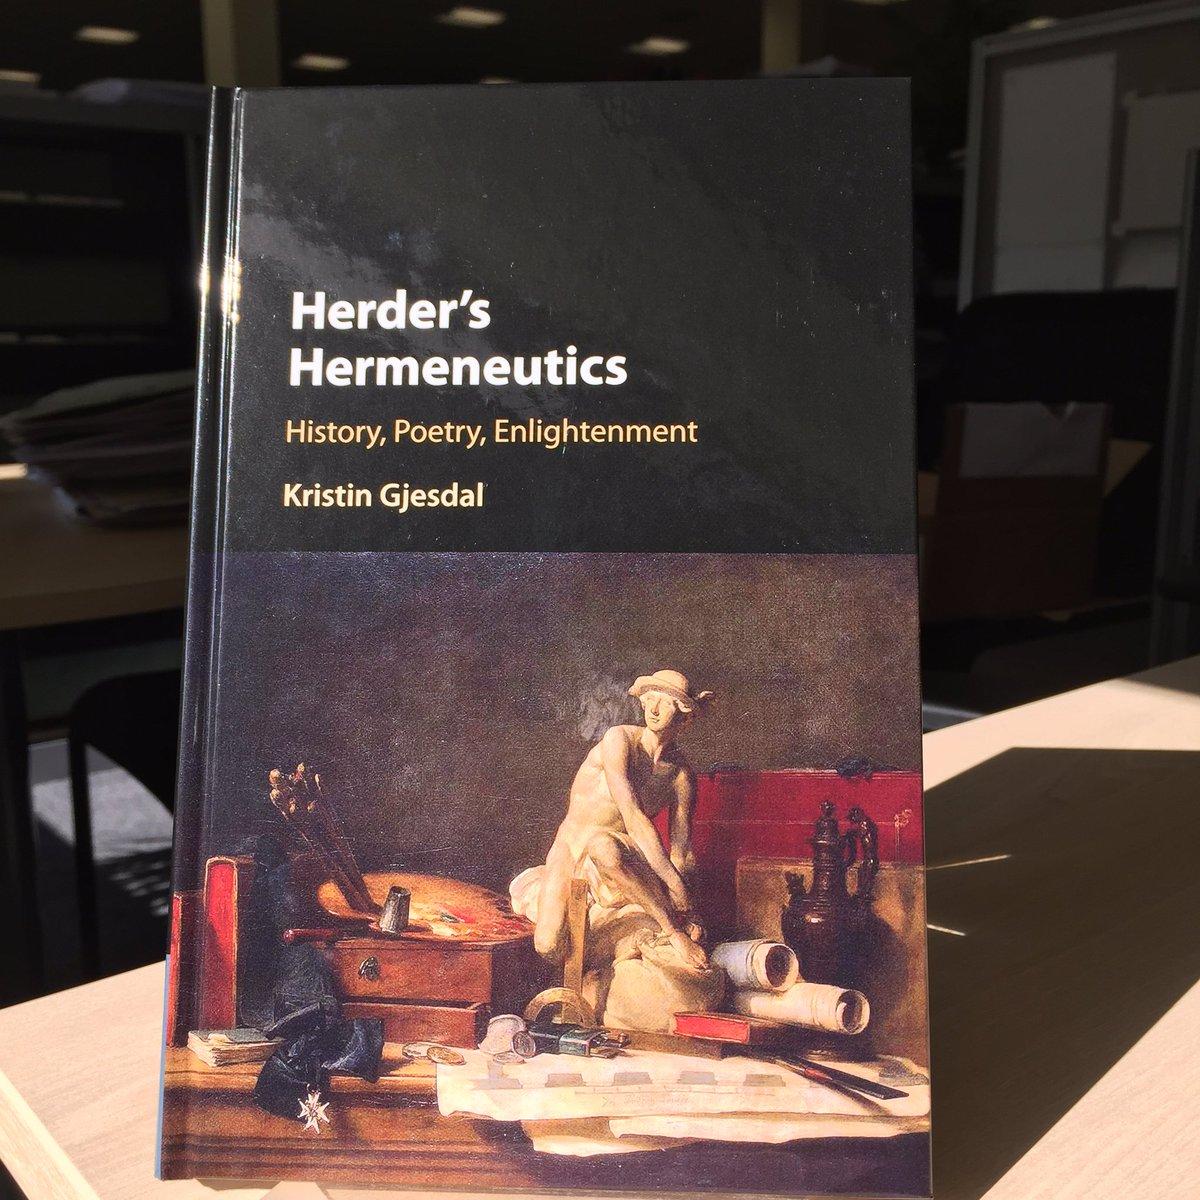 Themes in Post Keynesian Economics: Essays in Honour of Geoff Harcourt (Essays in Honour of Geoff Harcourt, V. 3) 1999